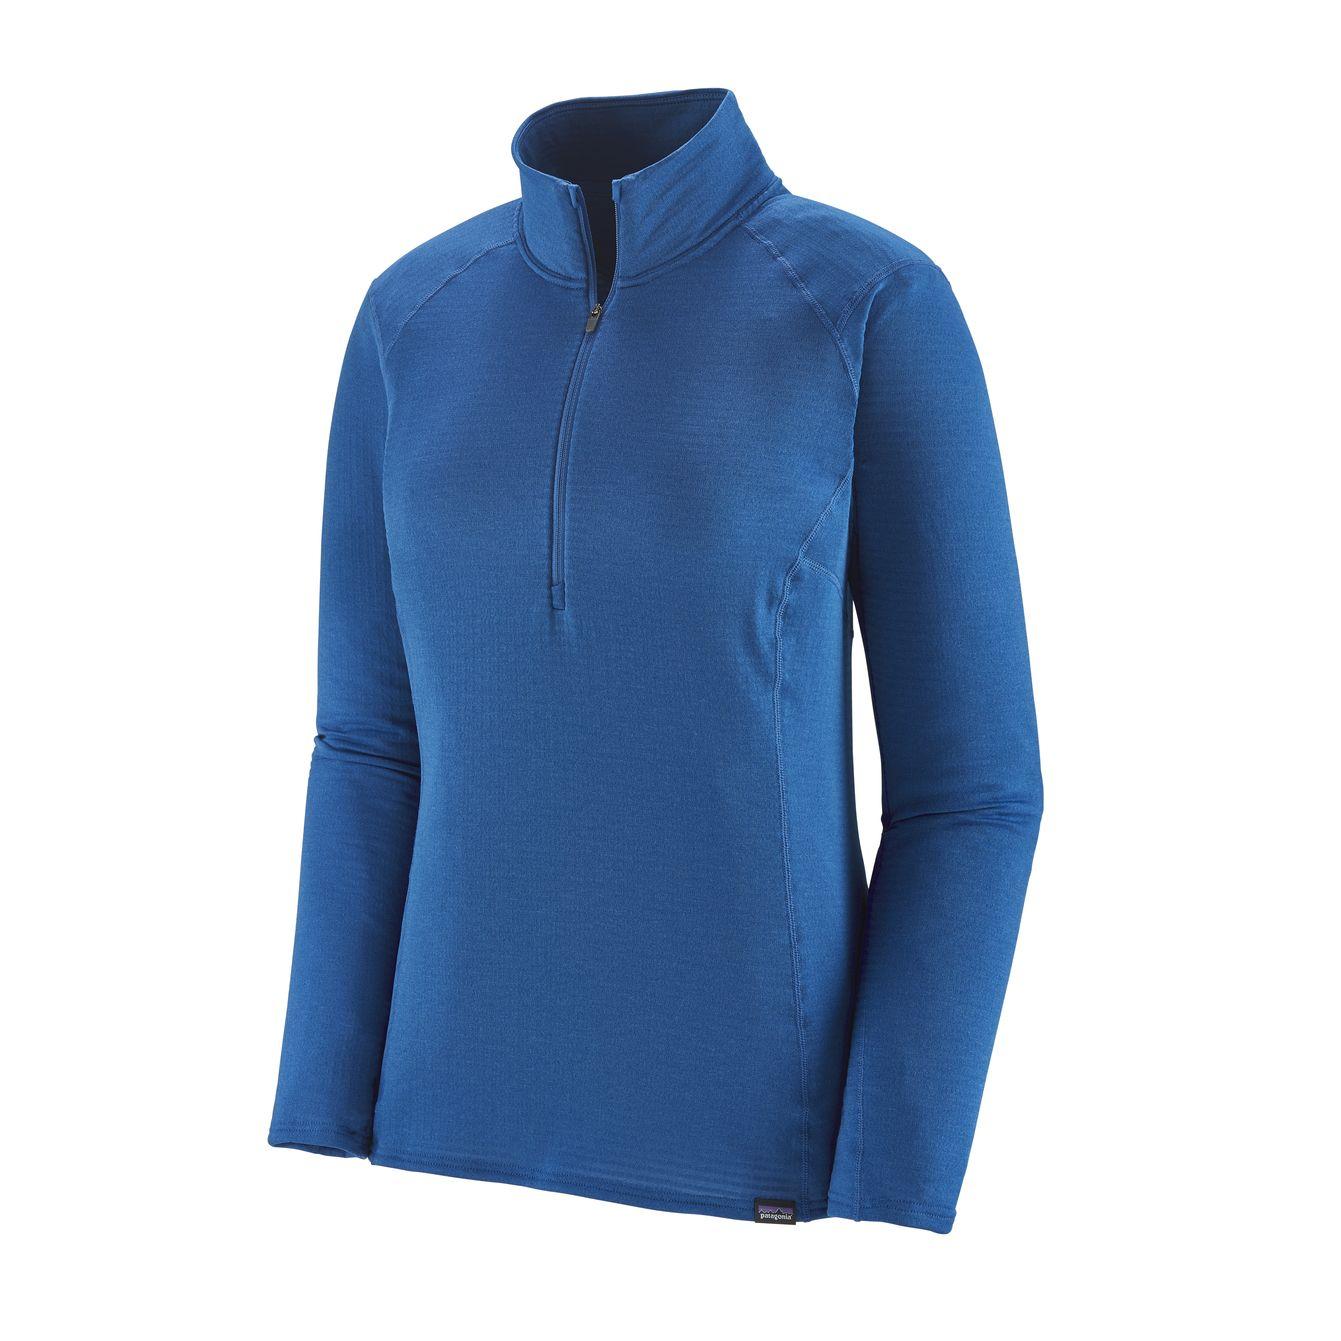 Patagonia - Capilene Thermal Weight Zip Neck - Funktionsshirt - Damen